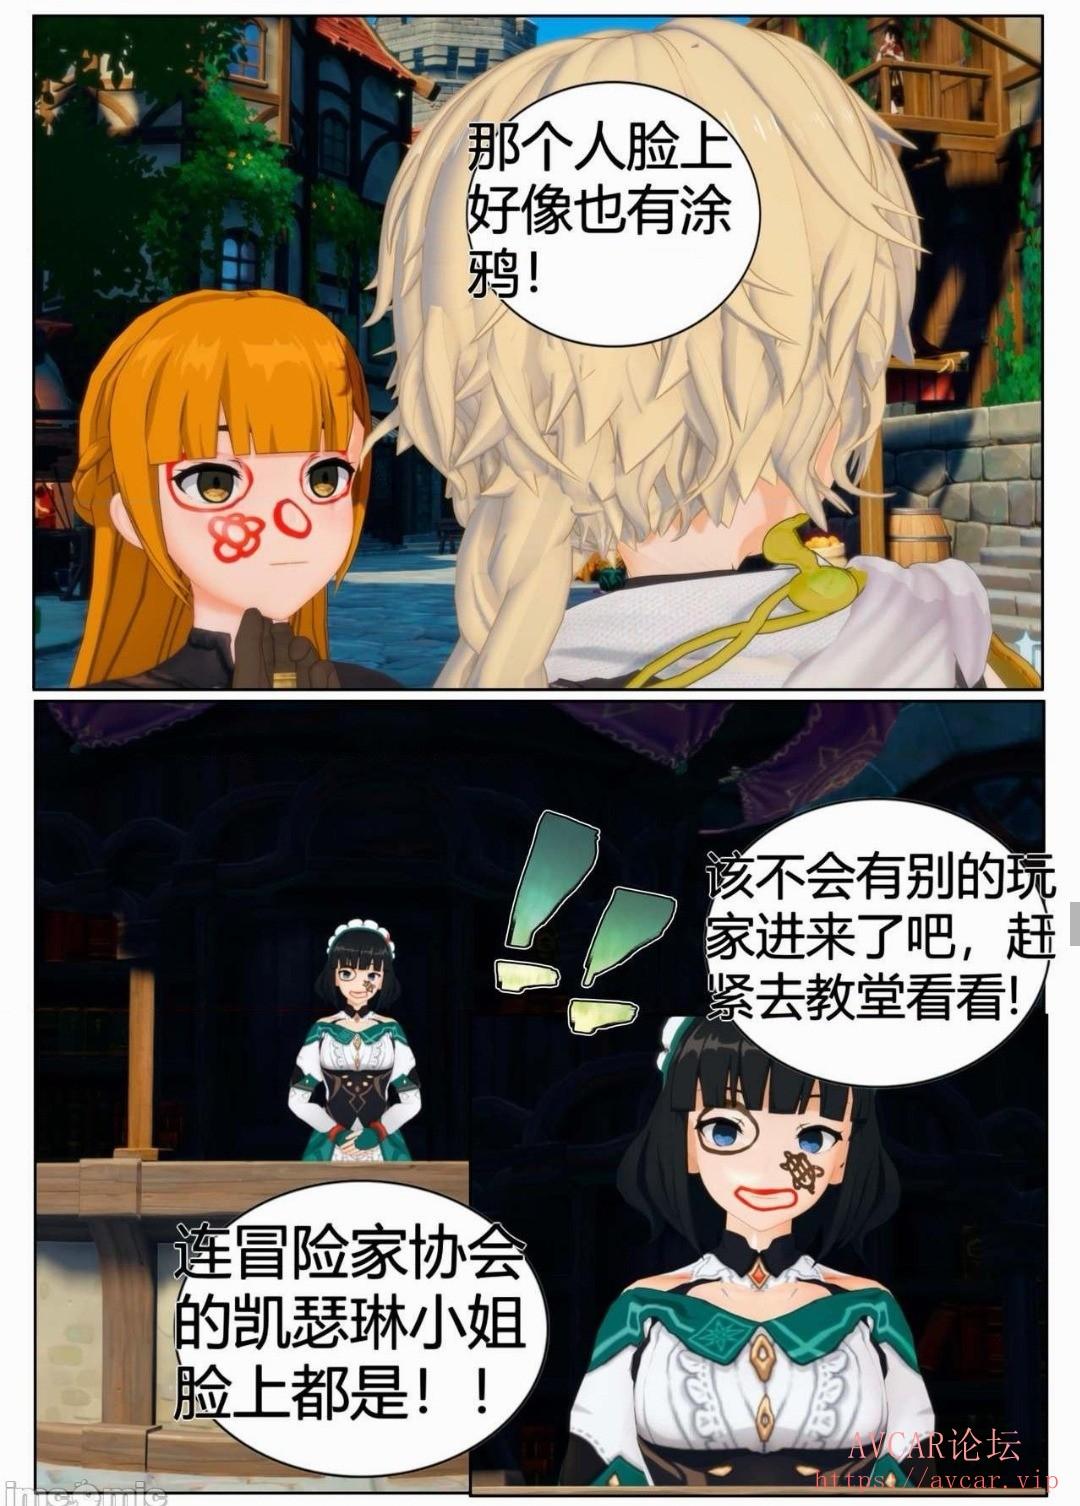 Screenshot_20210914_035554_com.new_comic18_edit_9168439675162.jpg